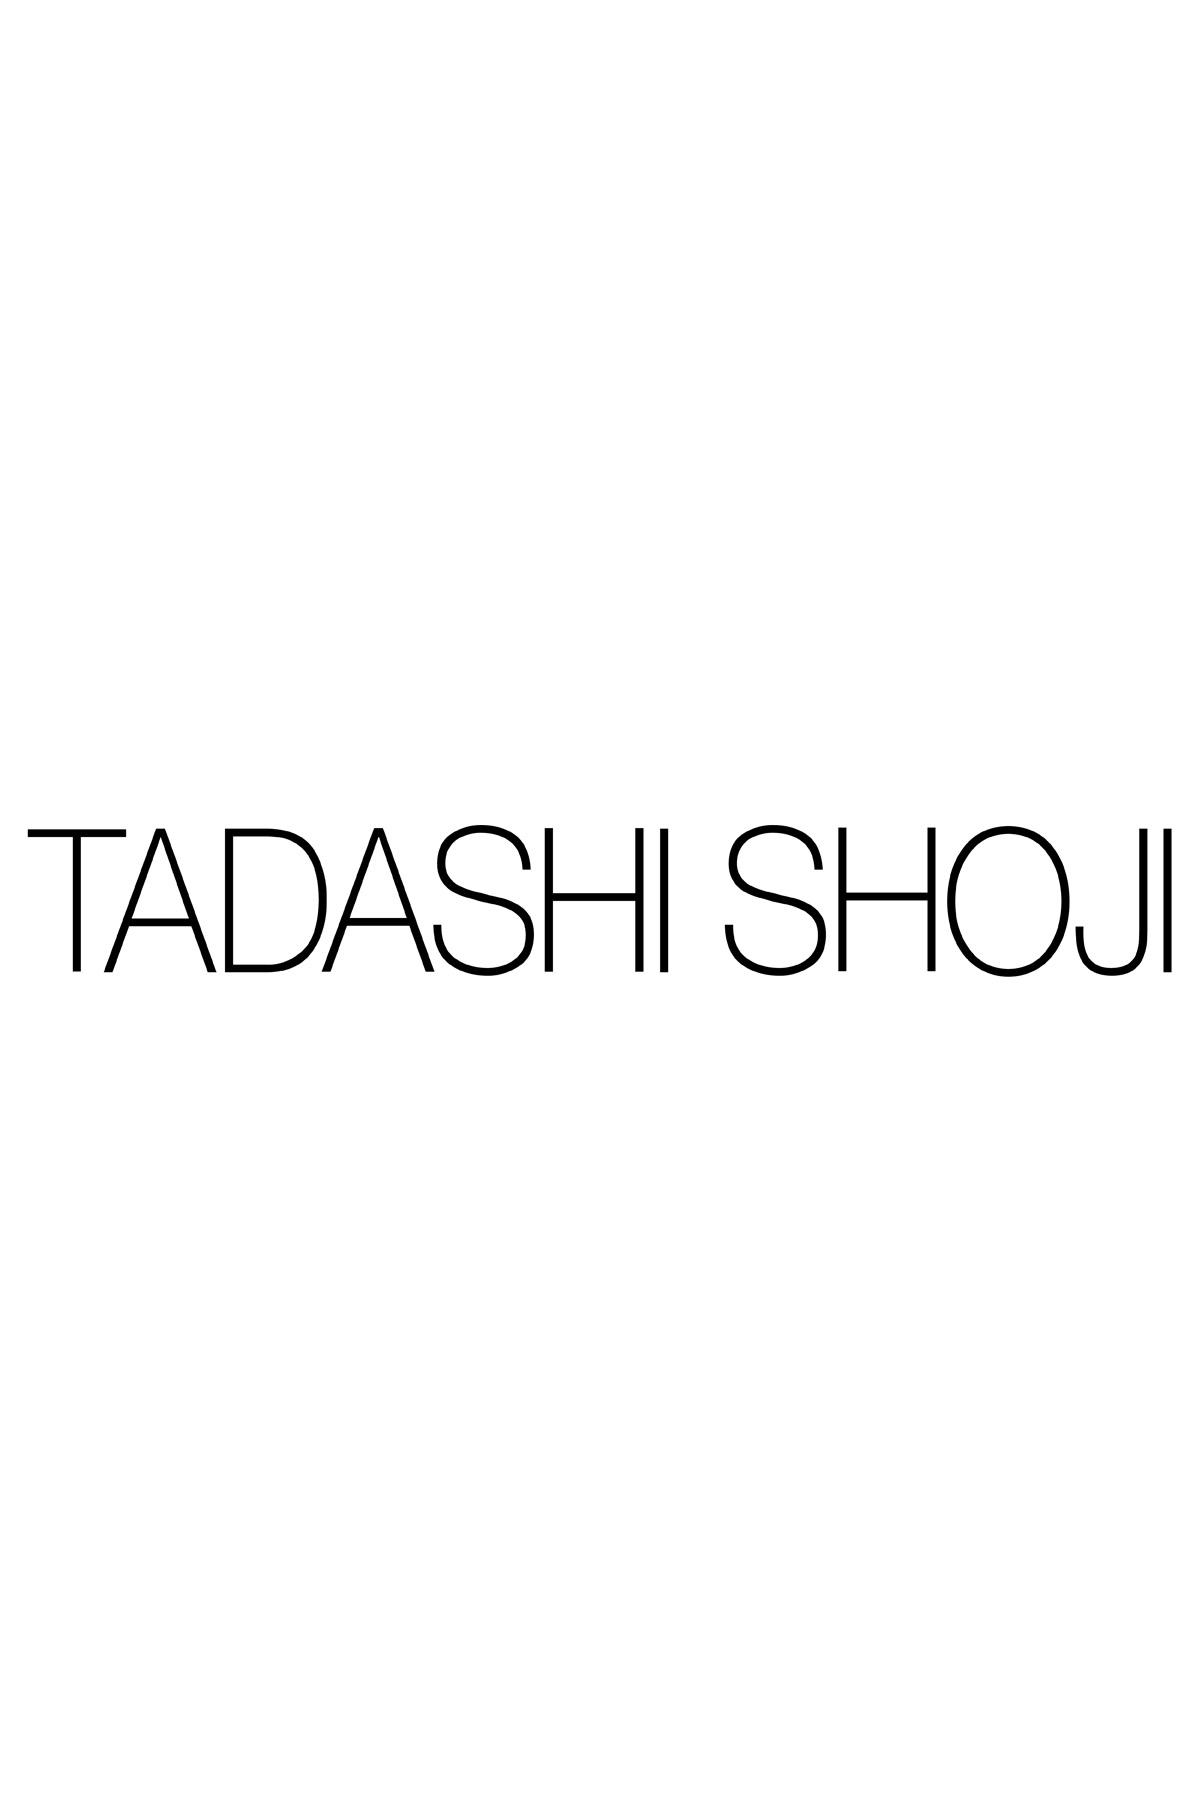 Tadashi Shoji - Embellished Peony-Motif Clutch